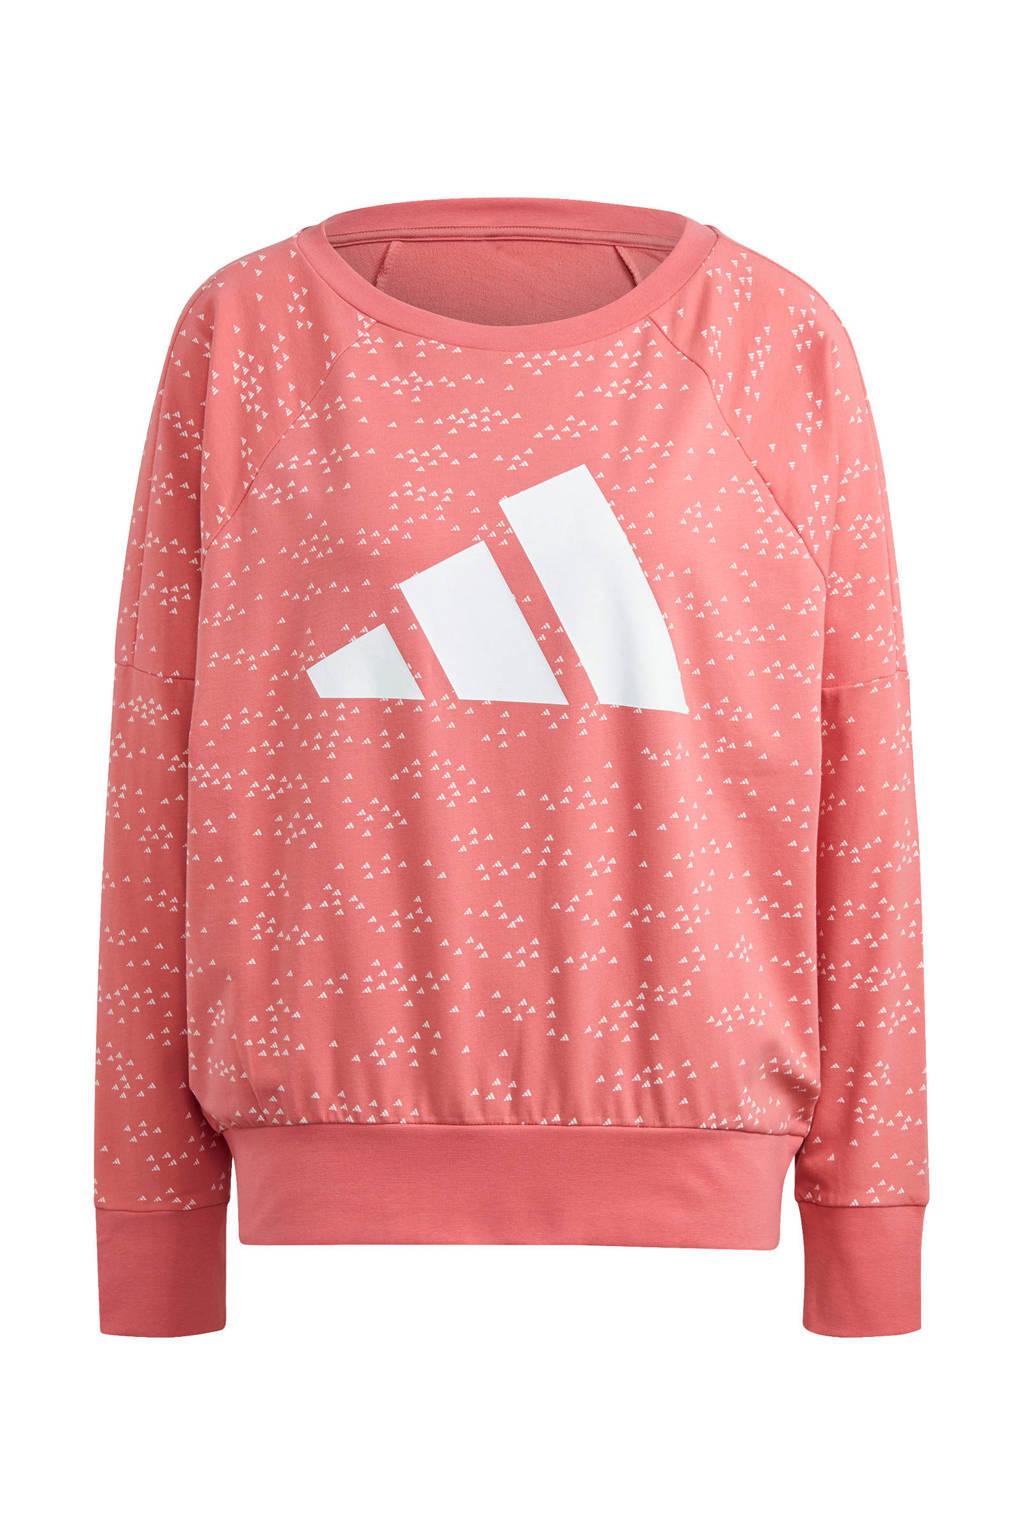 adidas Performance sweater lichtroze, Lichtroze